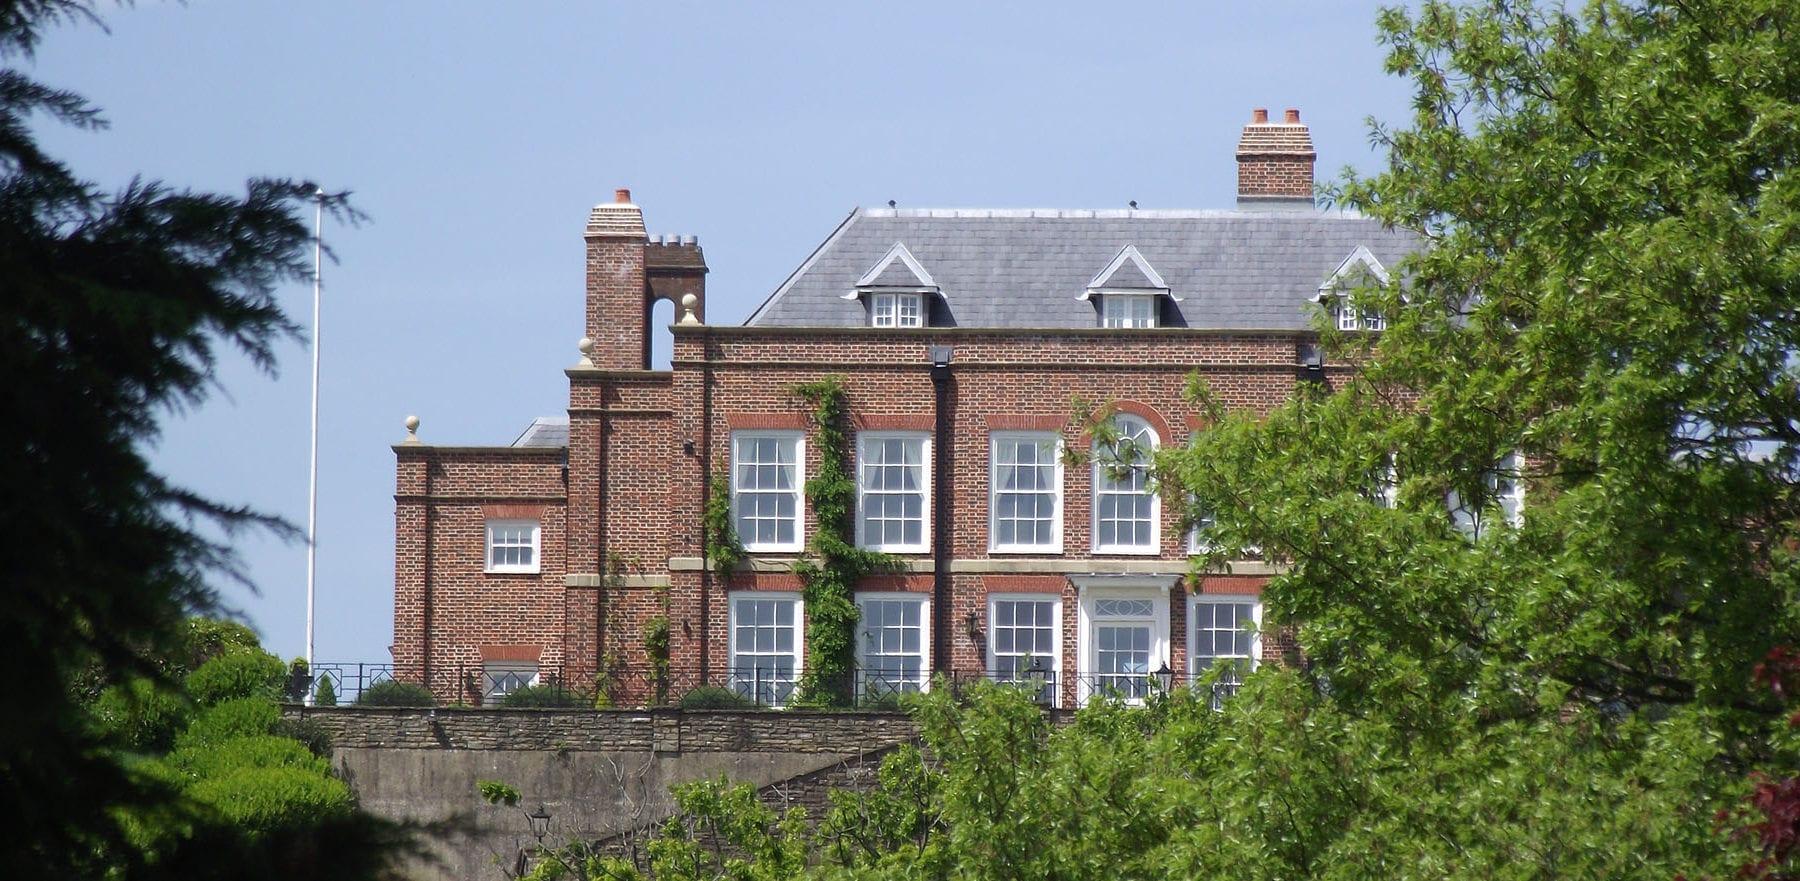 Lifestiles - Spanish Natural Slate Roof Tiles - Brook House, England 4